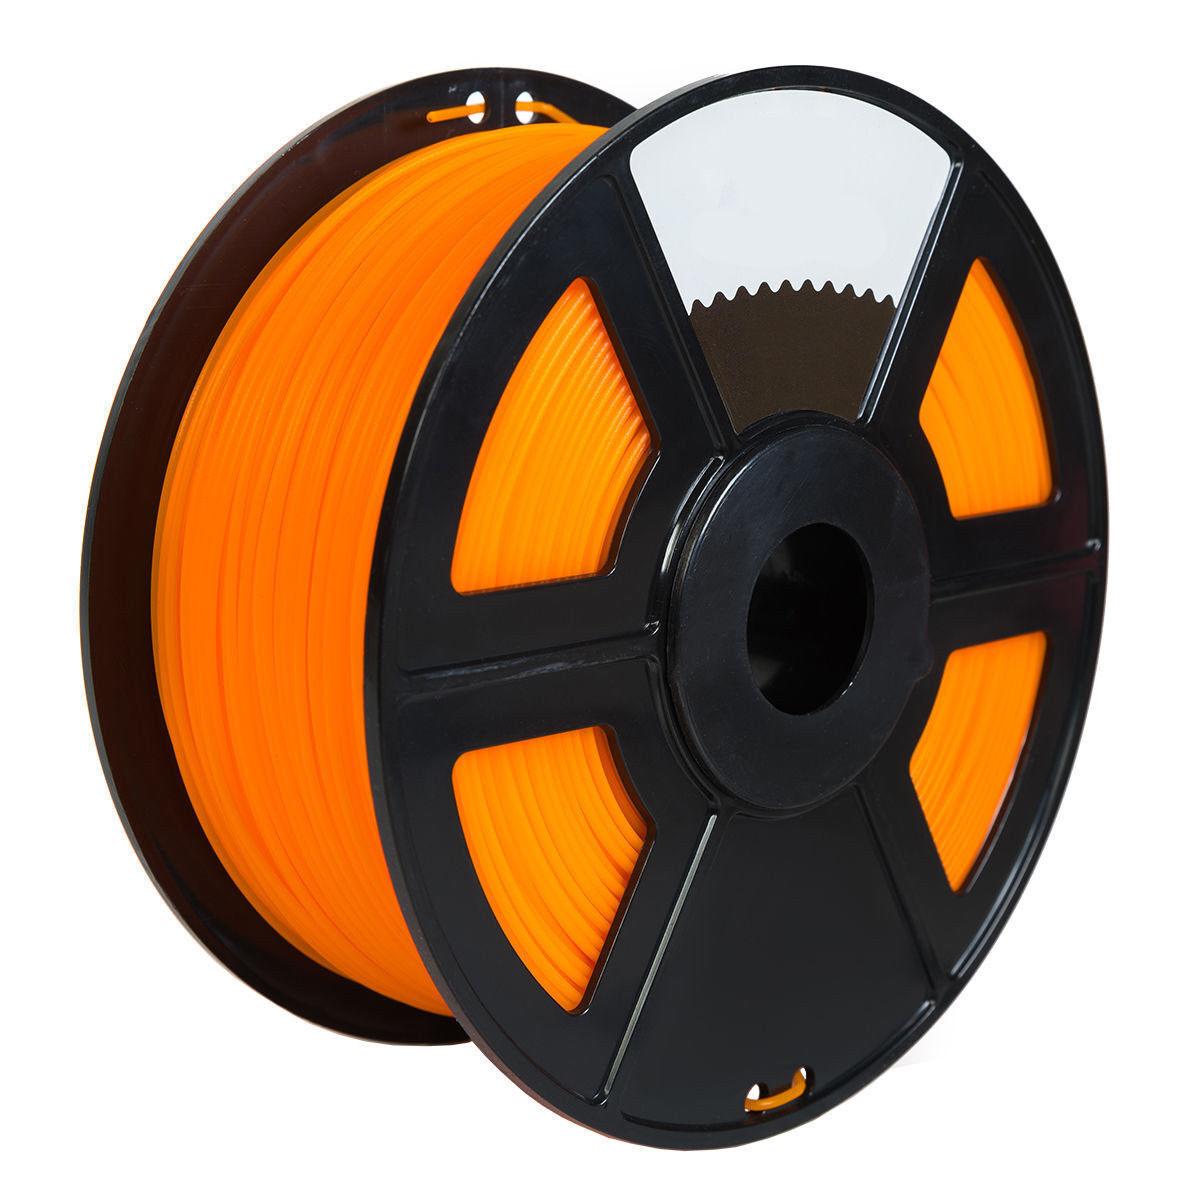 2PK Orange Color 3D Printer Filament 1.75mm 1KG PLA For Print MakerBot RepRap